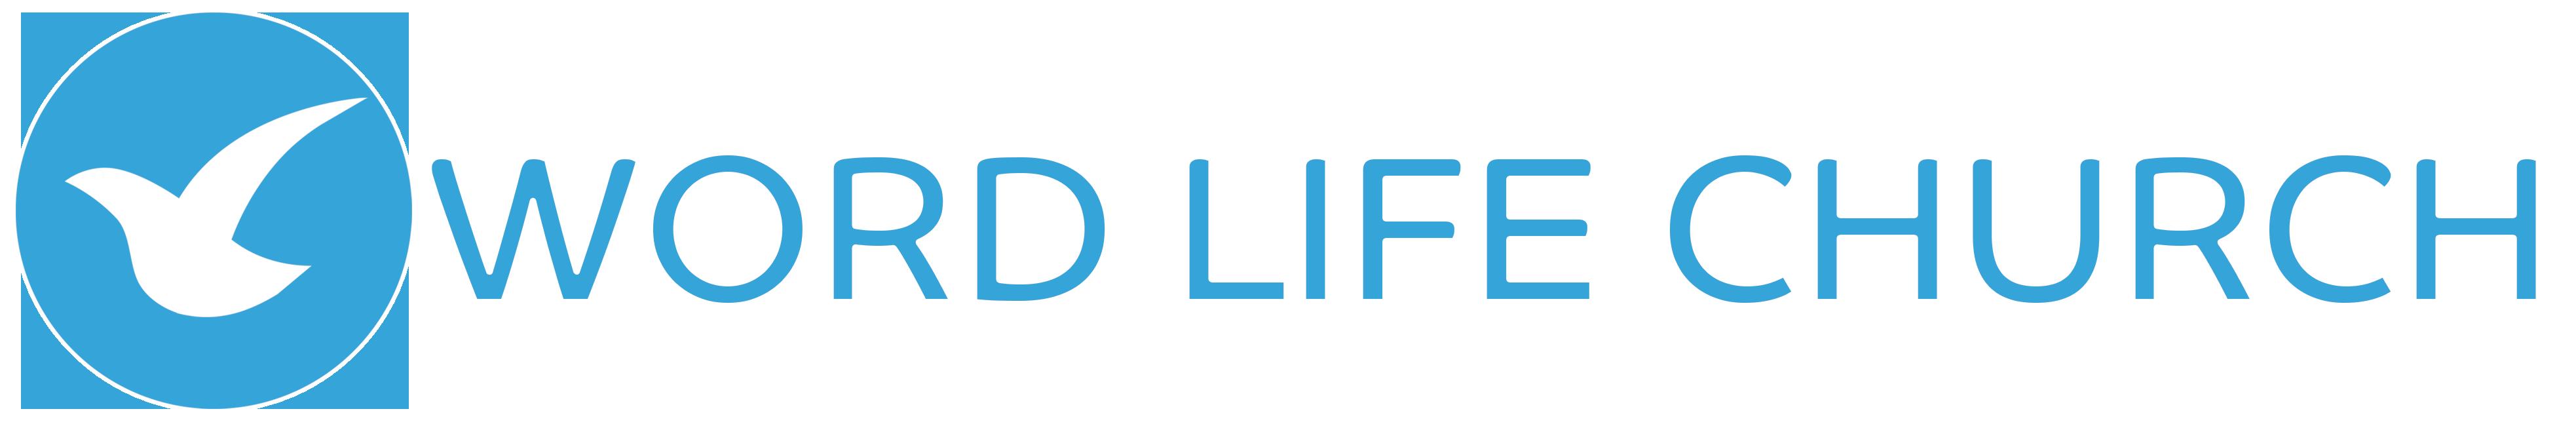 Word Life Church